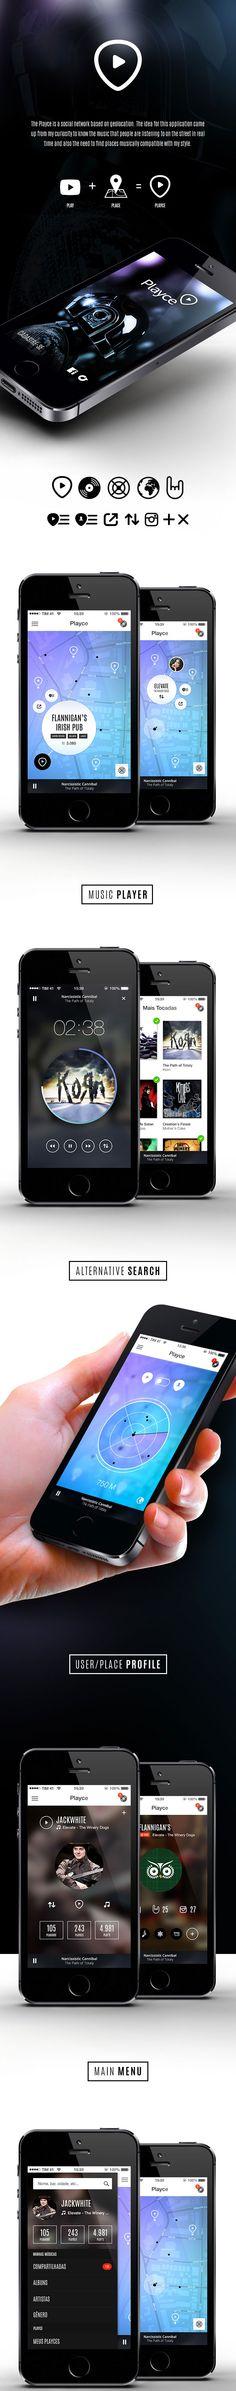 Playce mobile application design - #ux #ui